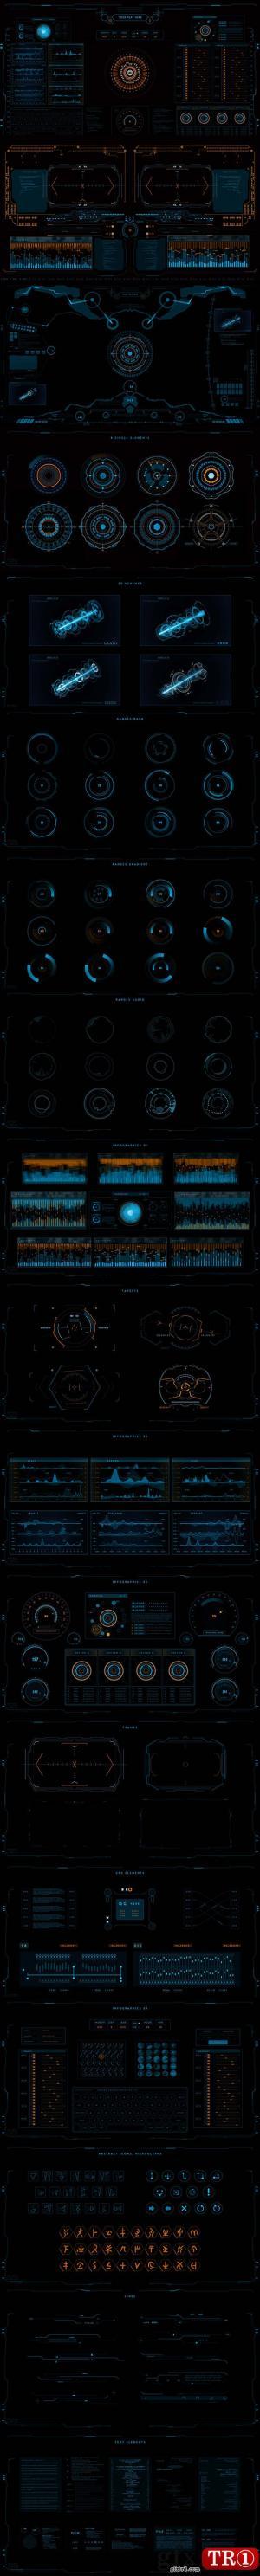 AE模板视频素材 250+4kSCI-FI科技面板ui界面设计包 17826577